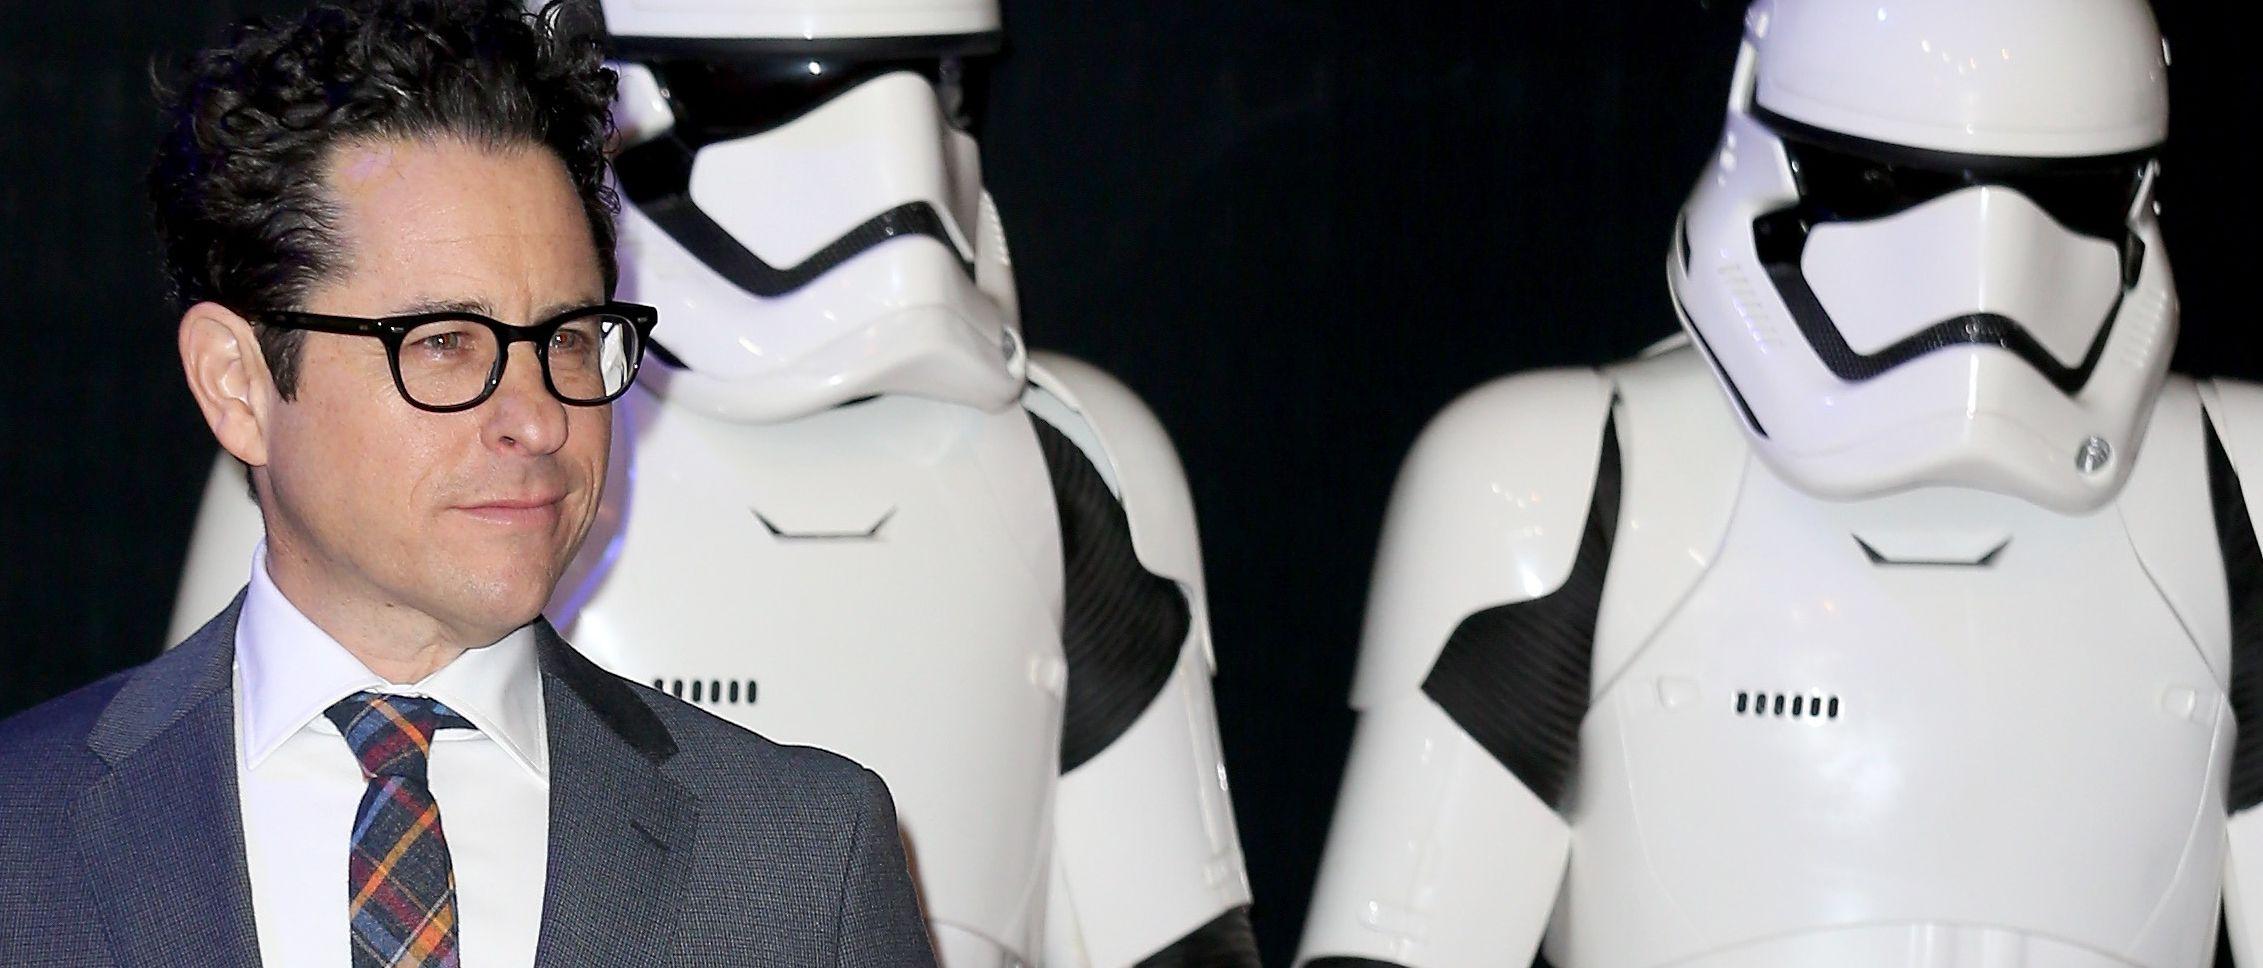 JJ Abrams Star Wars The Force Awakens Destroys Box fice